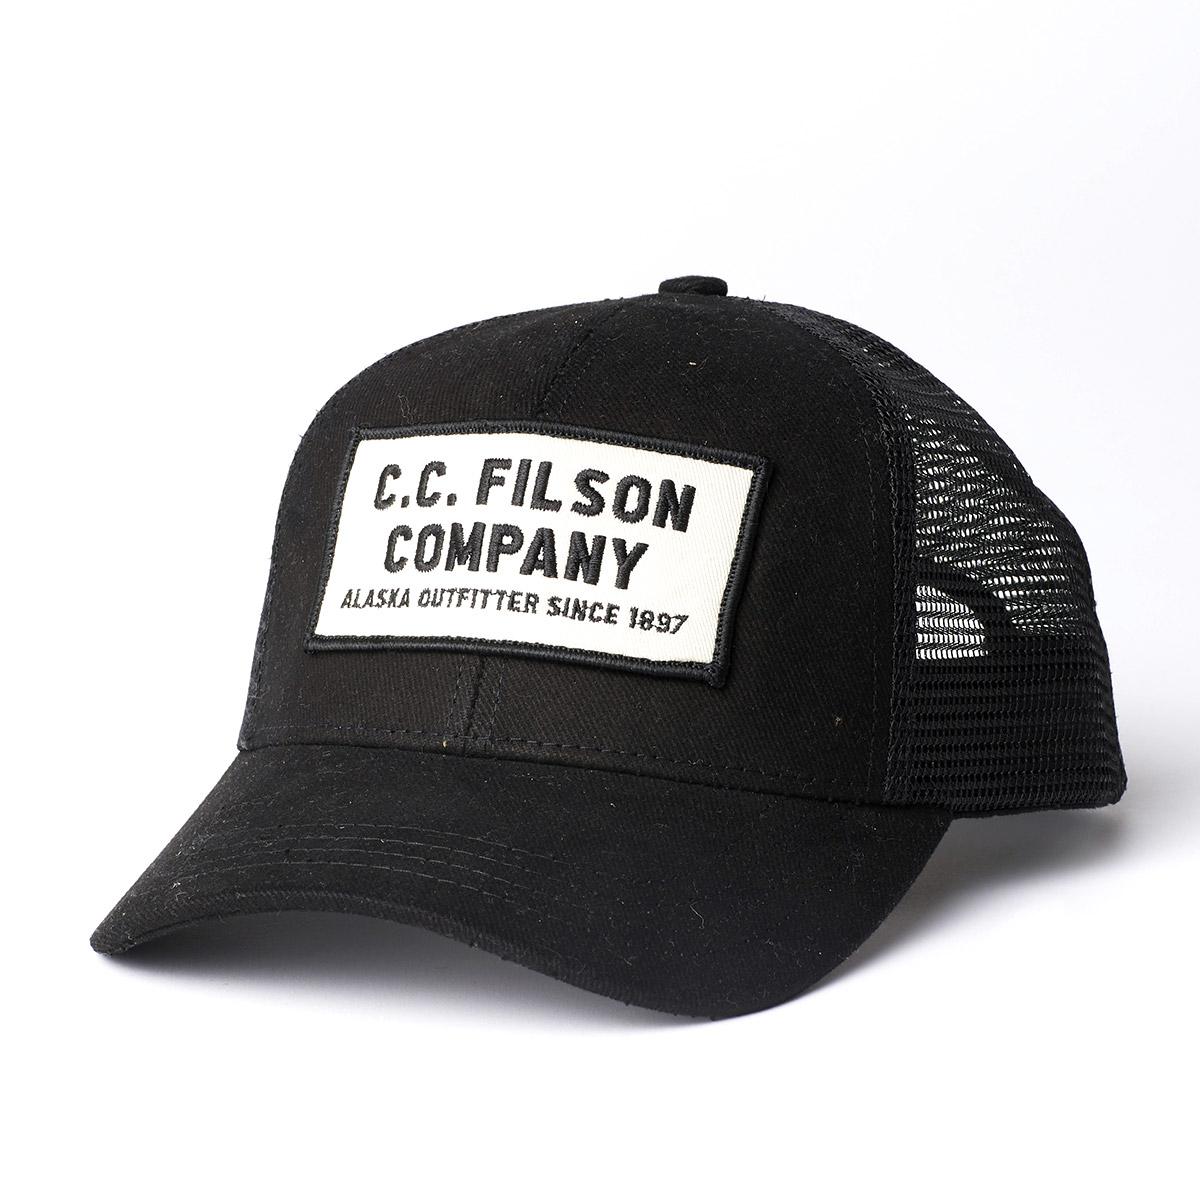 Filson Mesh Snap-Back Logger Cap 20172157 Black, slijtvaste pet met geborduurd Filson logo patch en mesh-bescherming